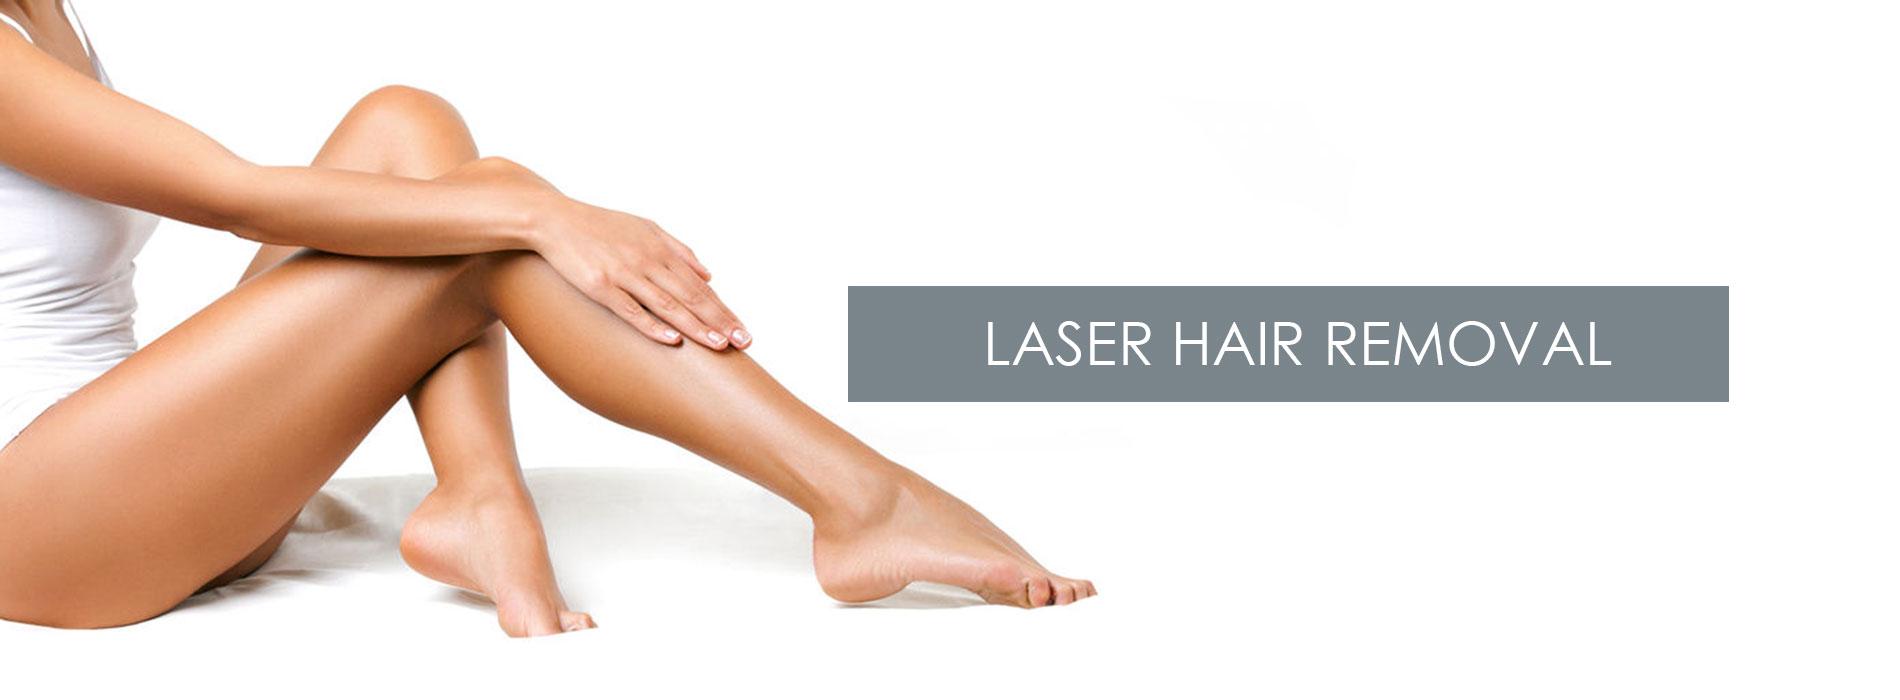 Laser-Hair-Removal-Dunstable-Harpenden Aesthetics Clinic